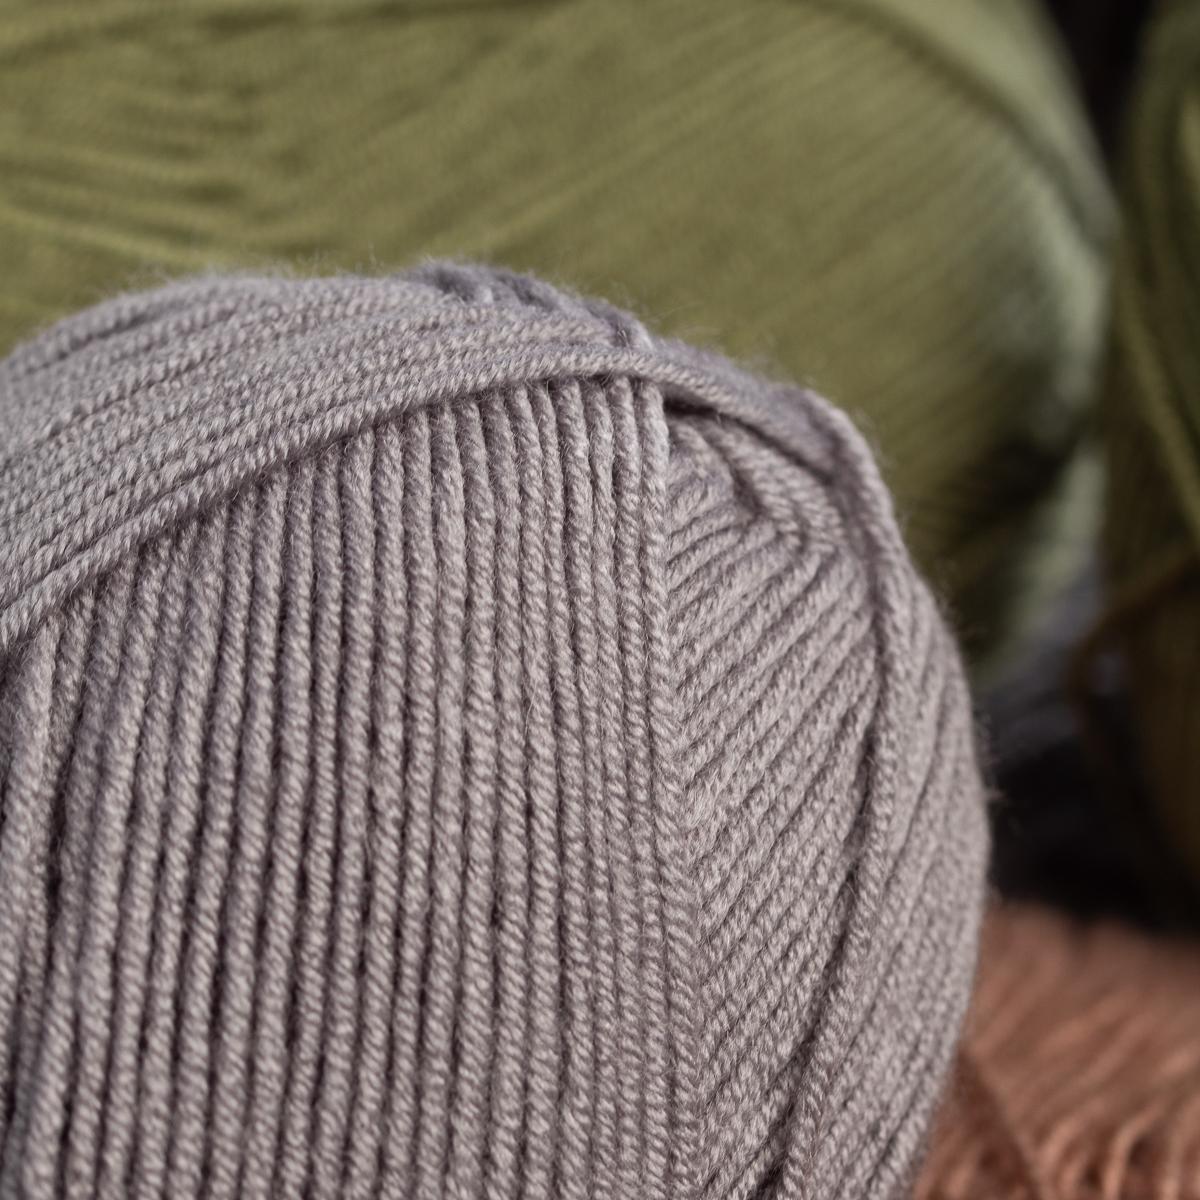 3pk-Lion-Brand-Vanna-039-s-Style-100-Acrylic-Yarn-Light-3-Knit-Crochet-Skeins-Soft thumbnail 11